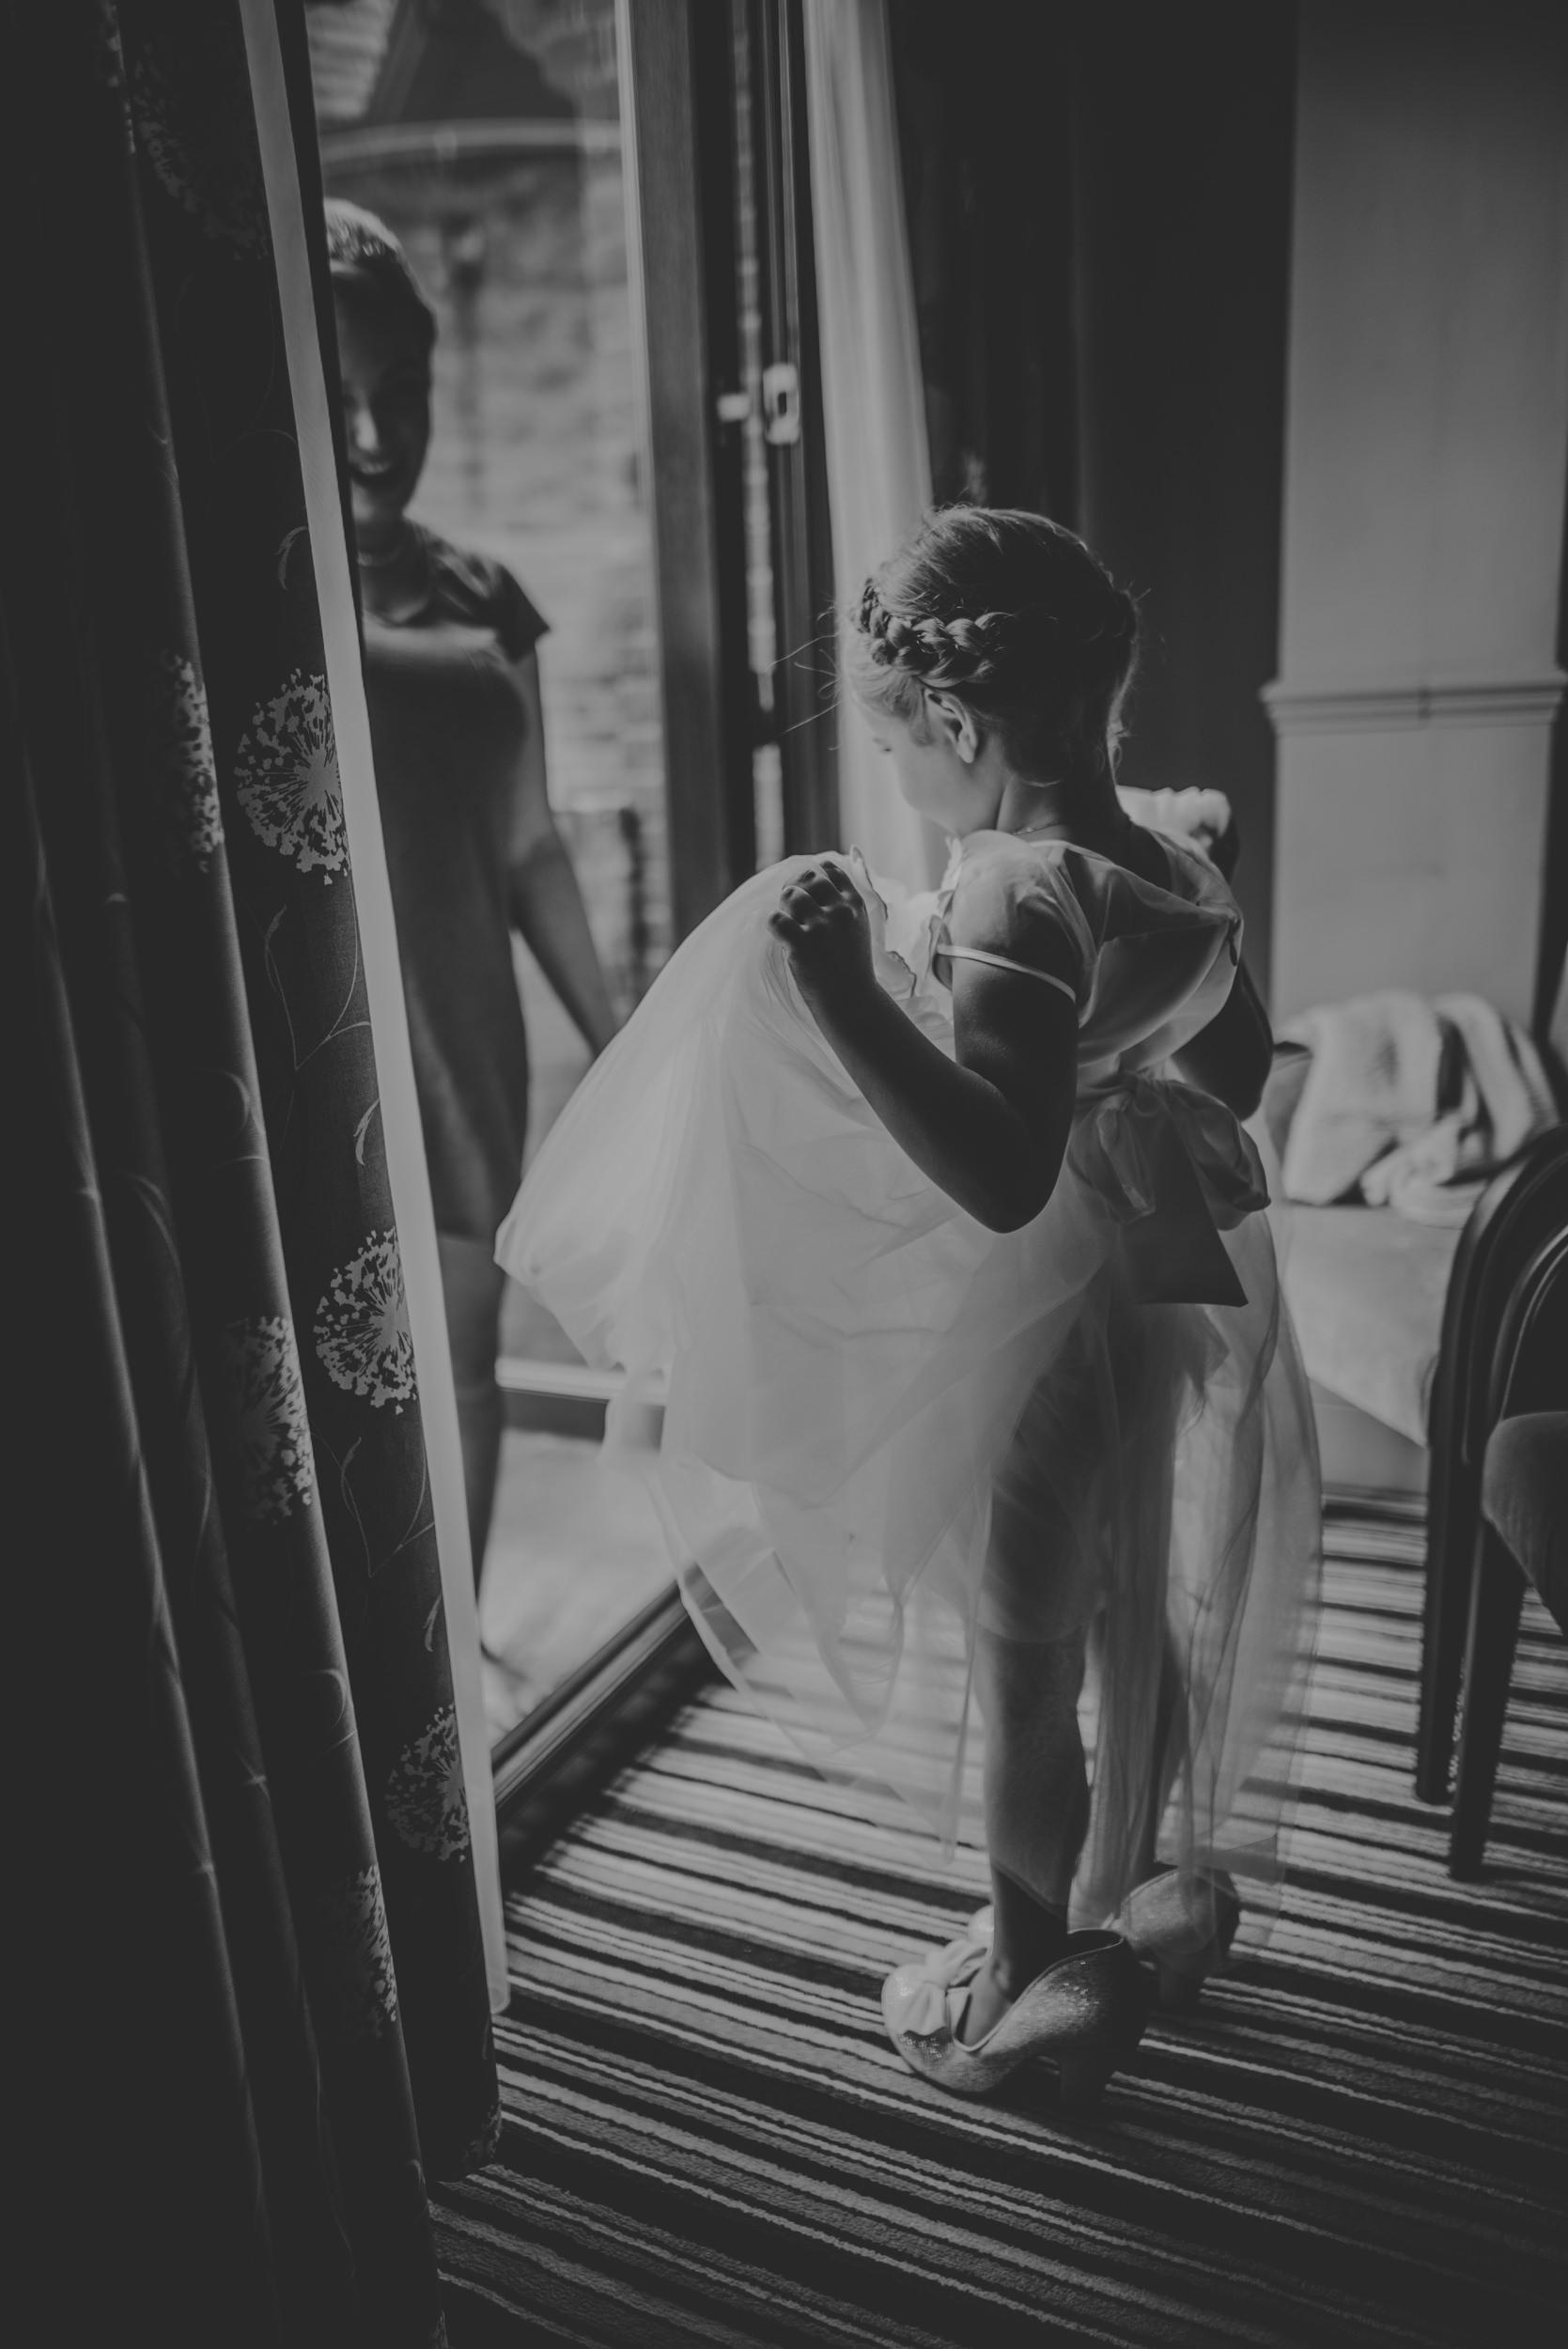 Chantelle-and-Stephen-Old-Thorns-Hotel-Wedding-Liphook-Manu-Mendoza-Wedding-Photography-115.jpg